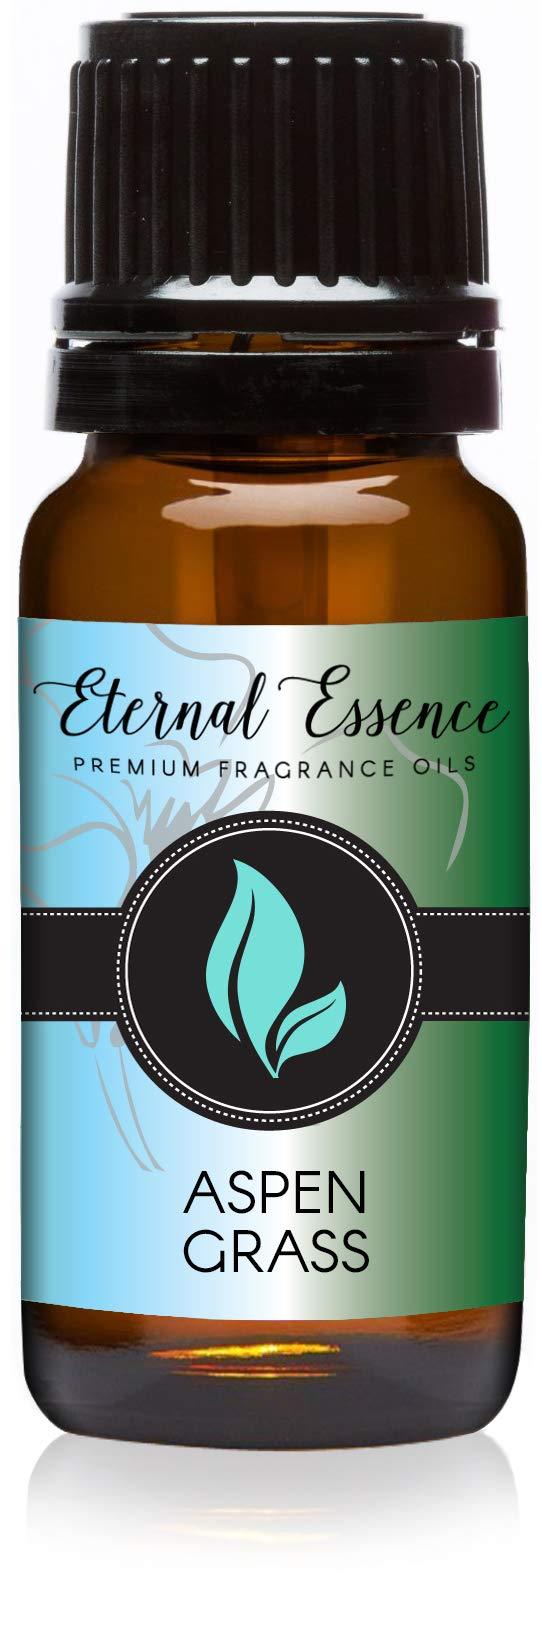 Aspen Grass - Premium Grade Fragrance Oils - 10ml - Scented Oil